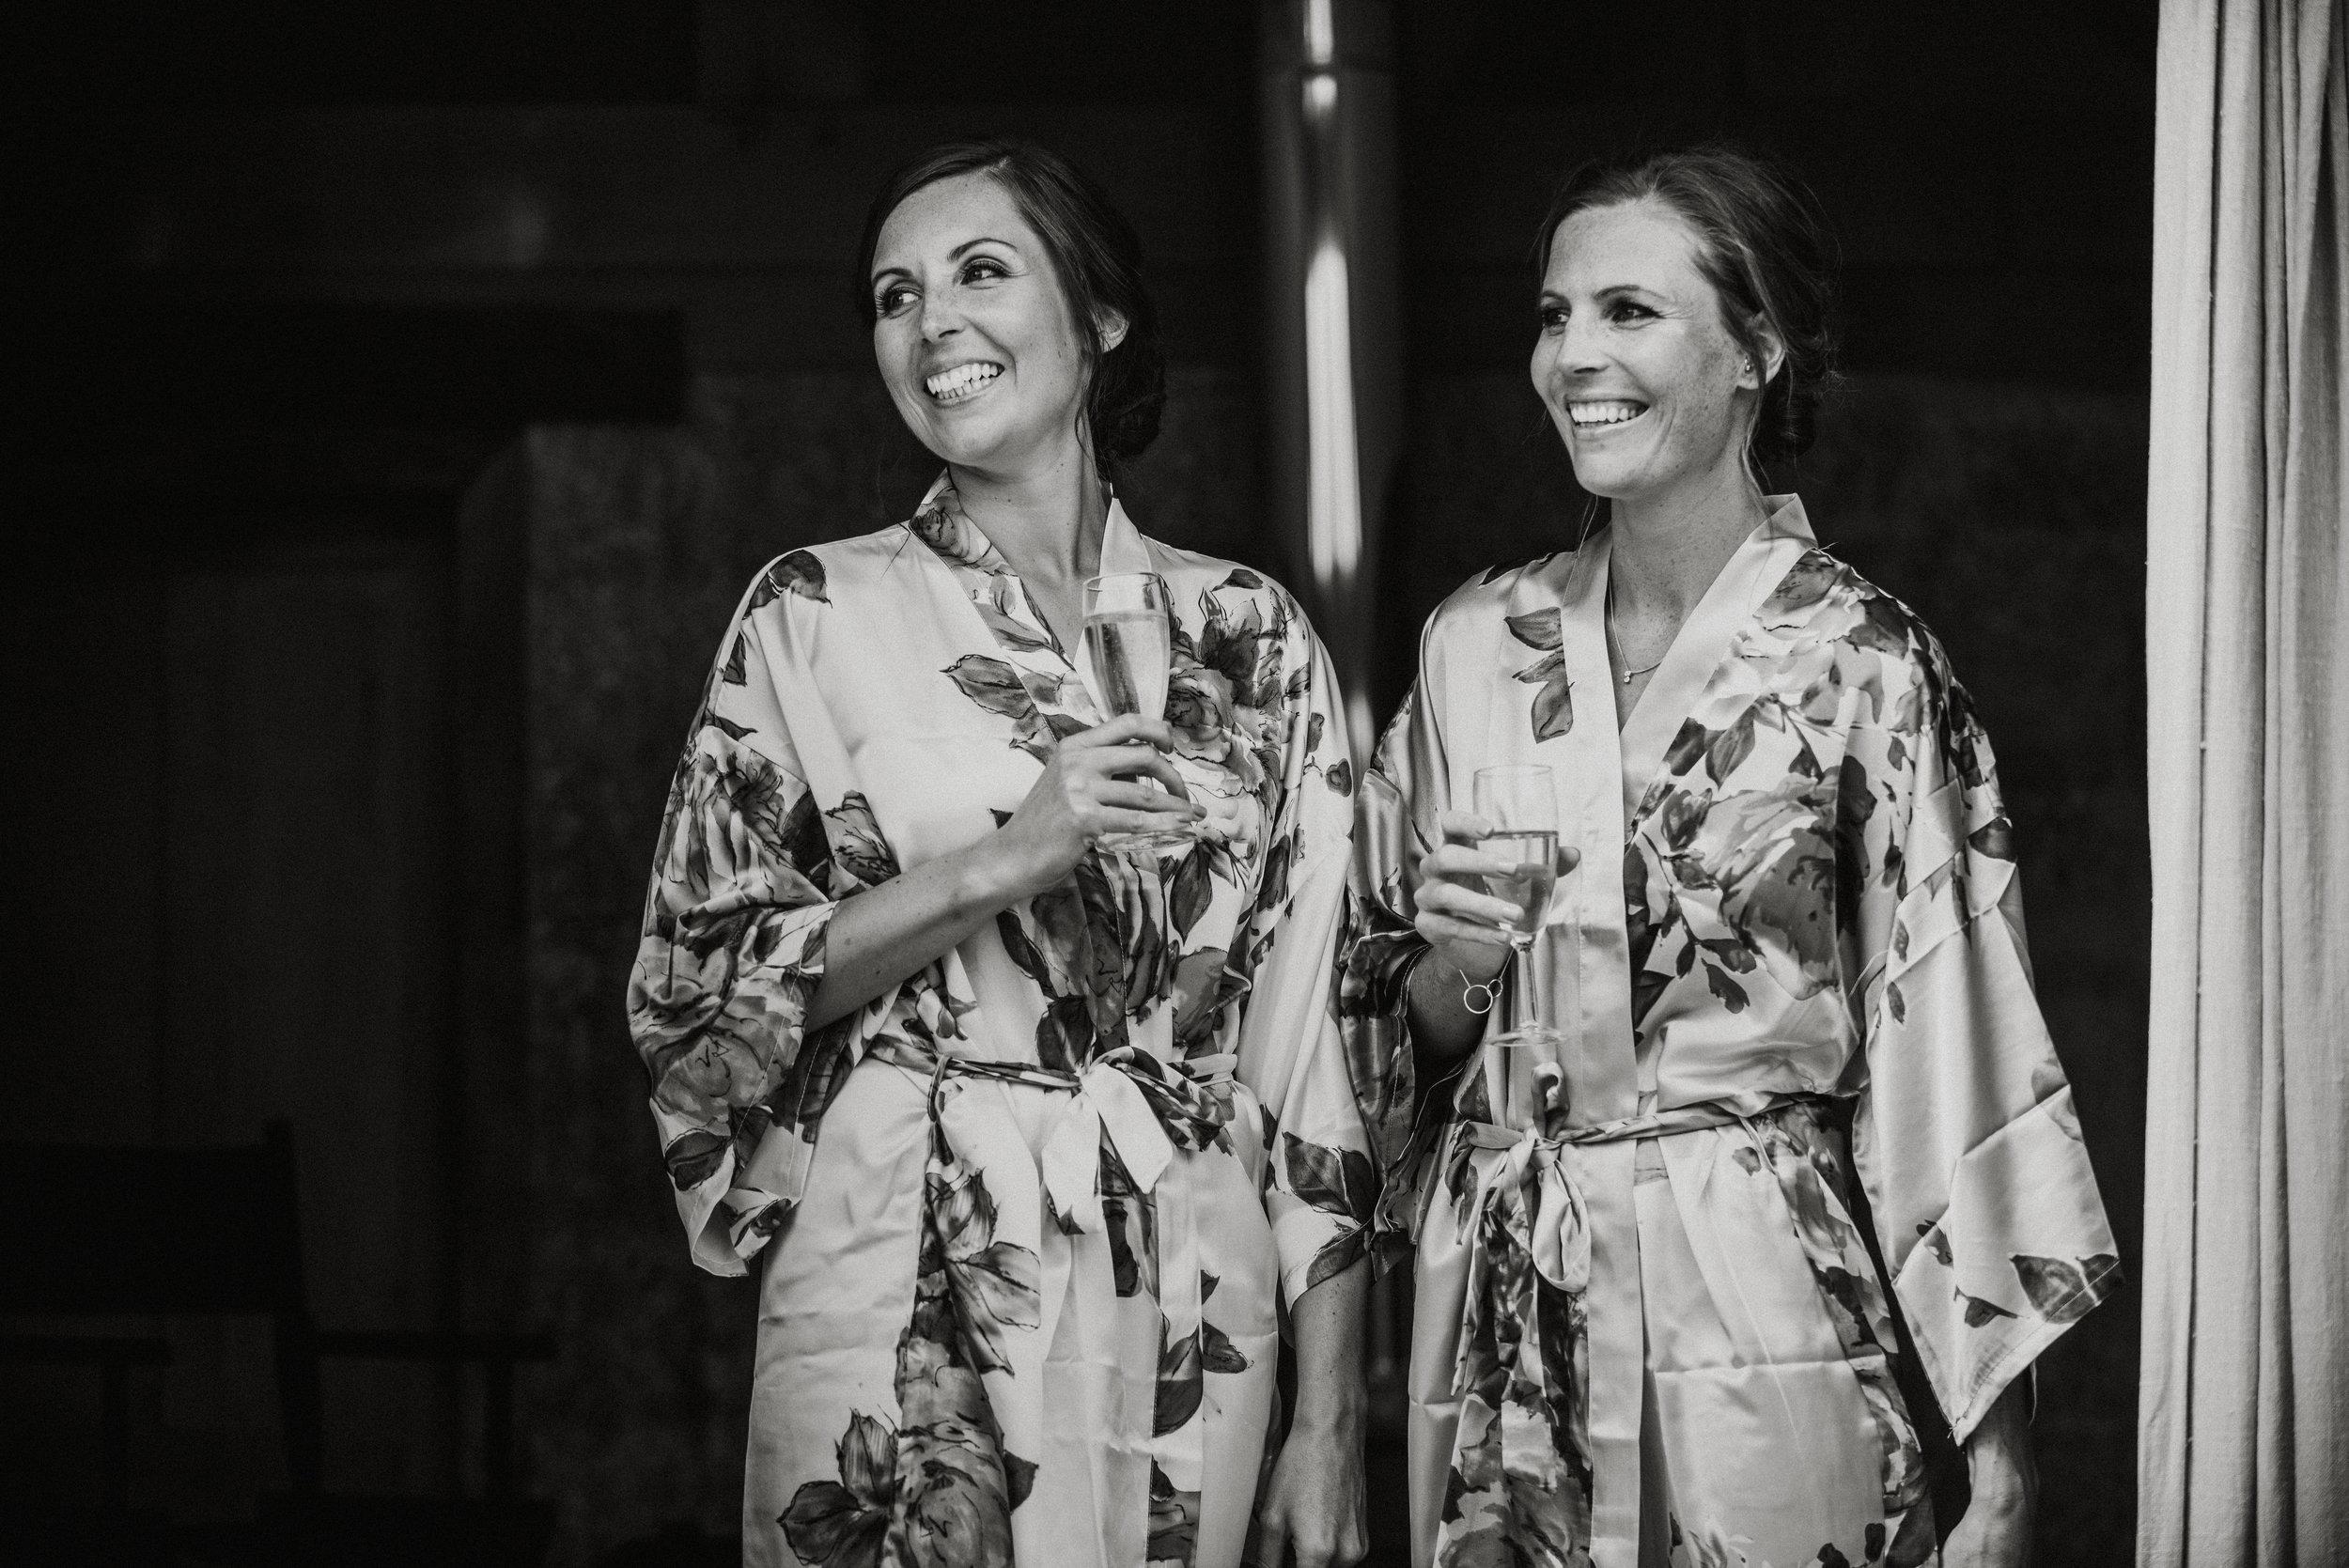 nancarrow-farm-wedding-photographer-21.jpg